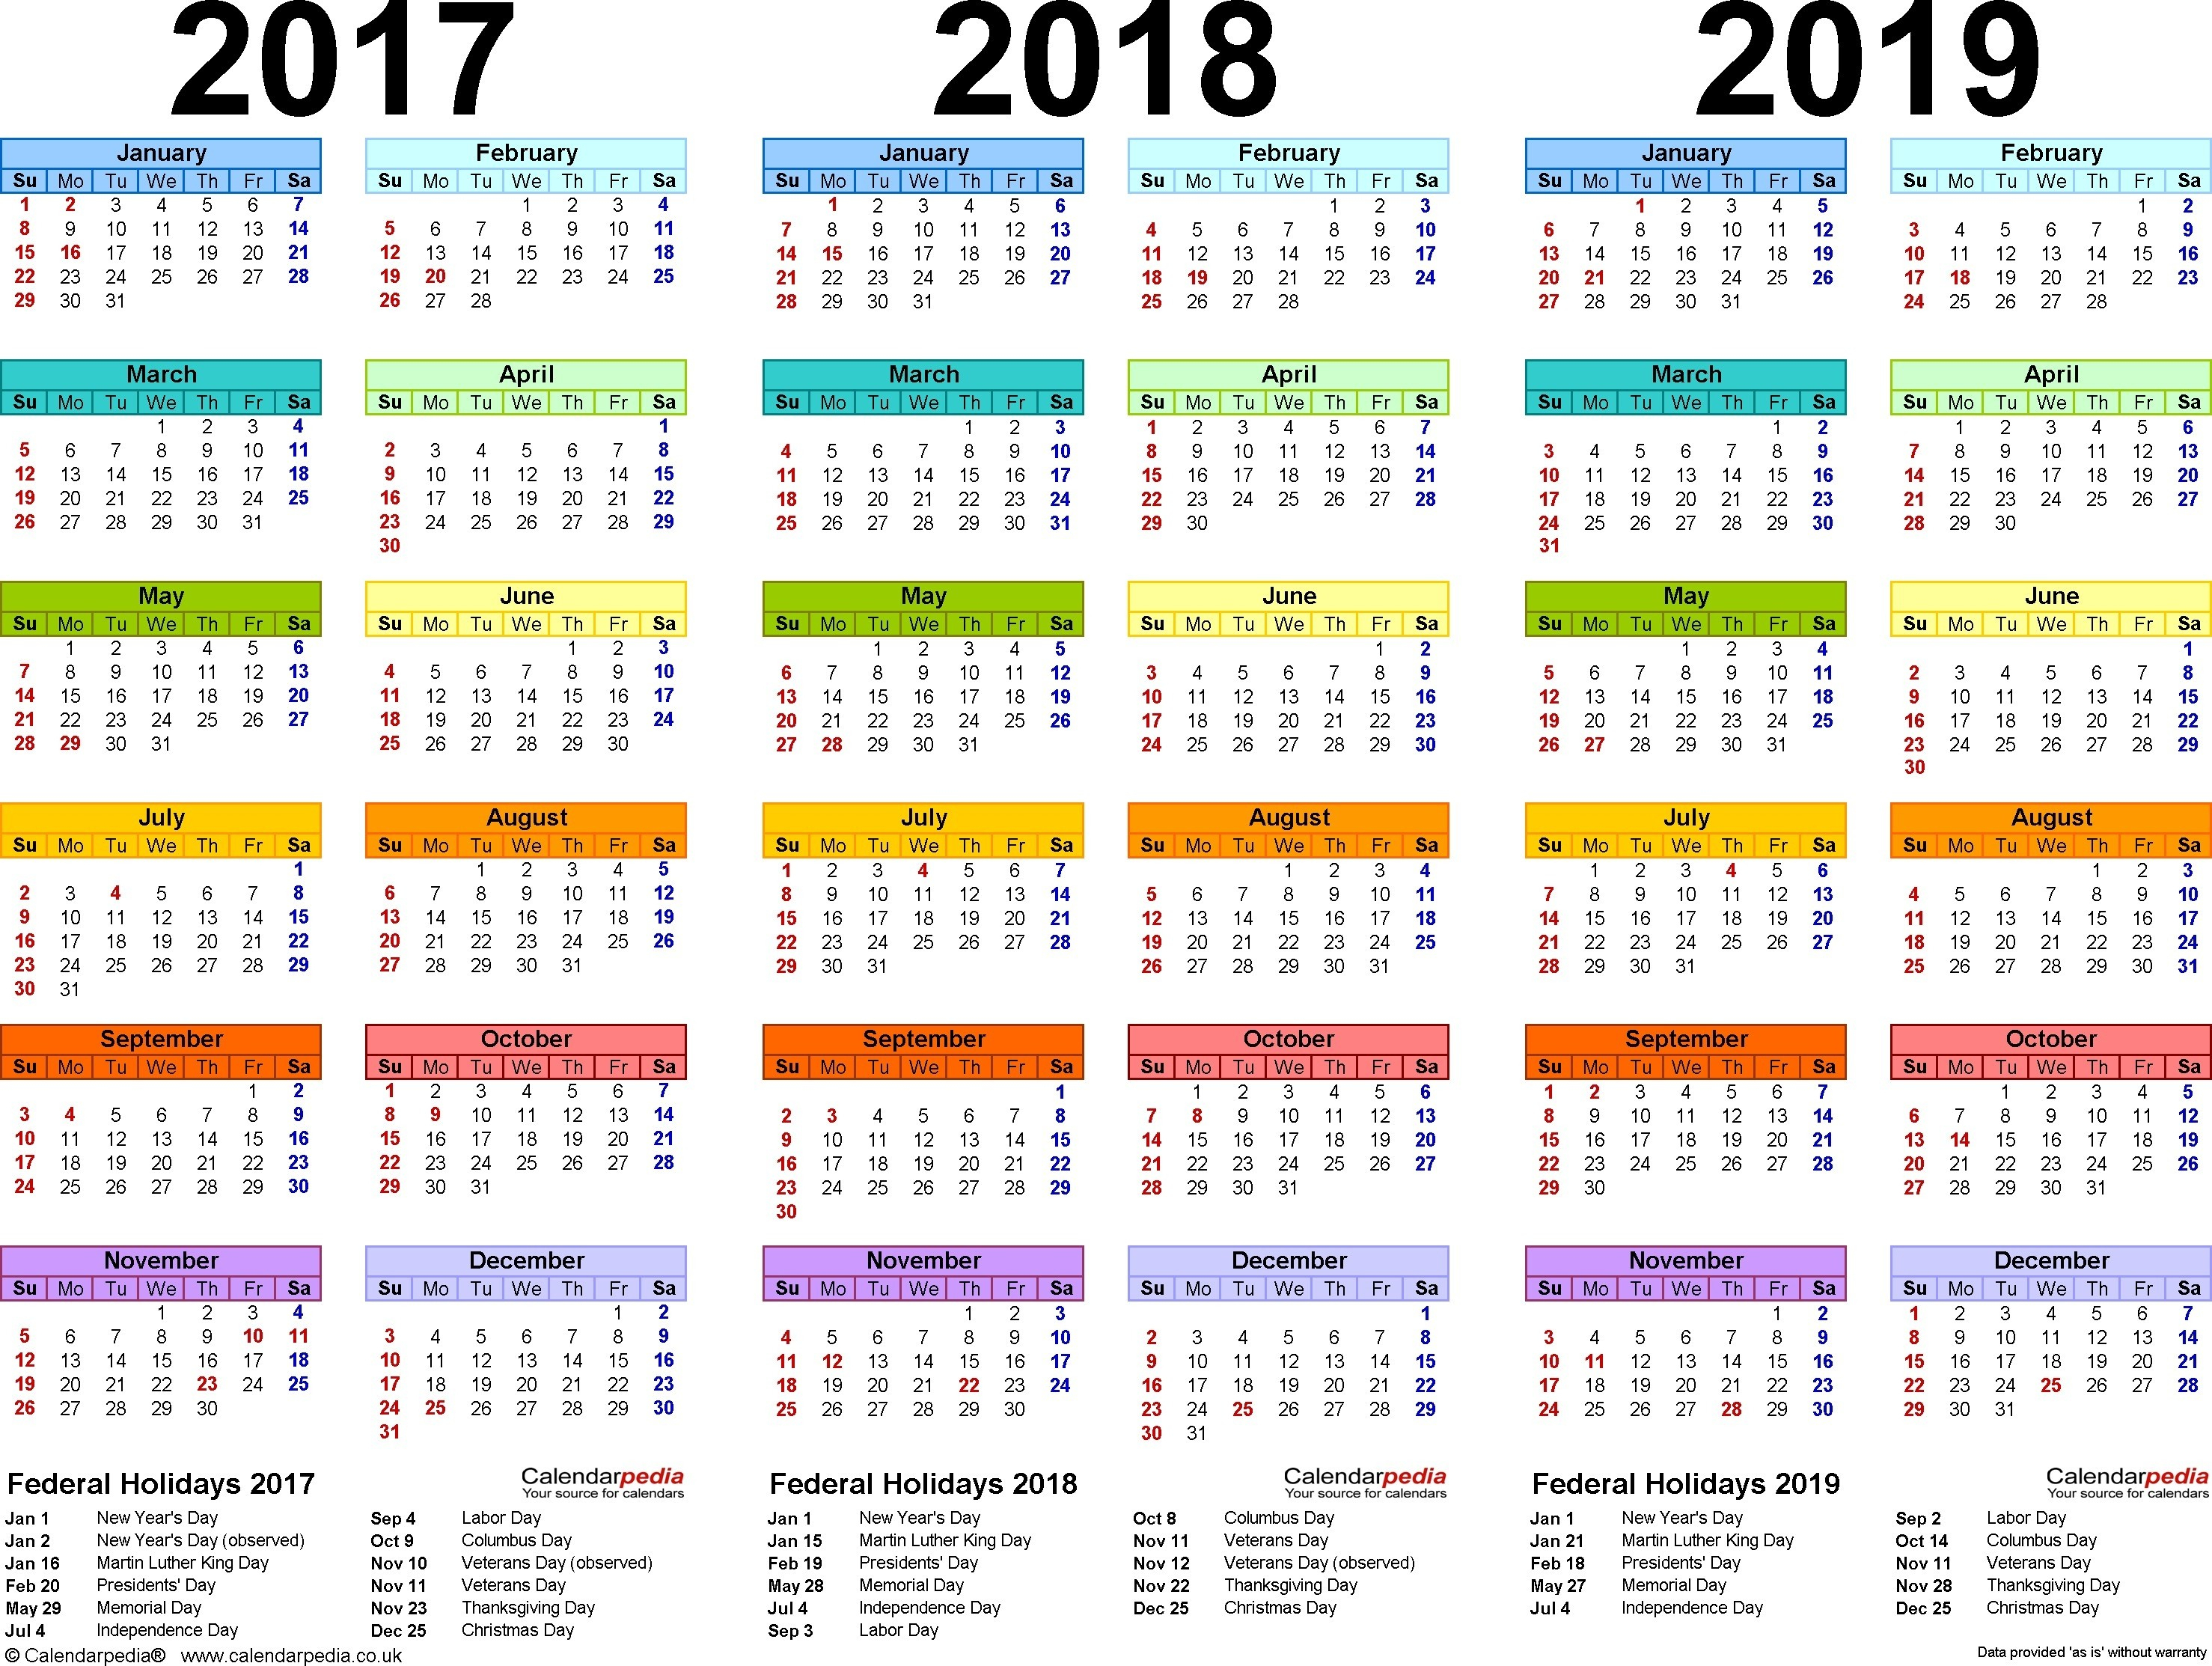 Depo Provera Calendar 2019 Printable Download For Free